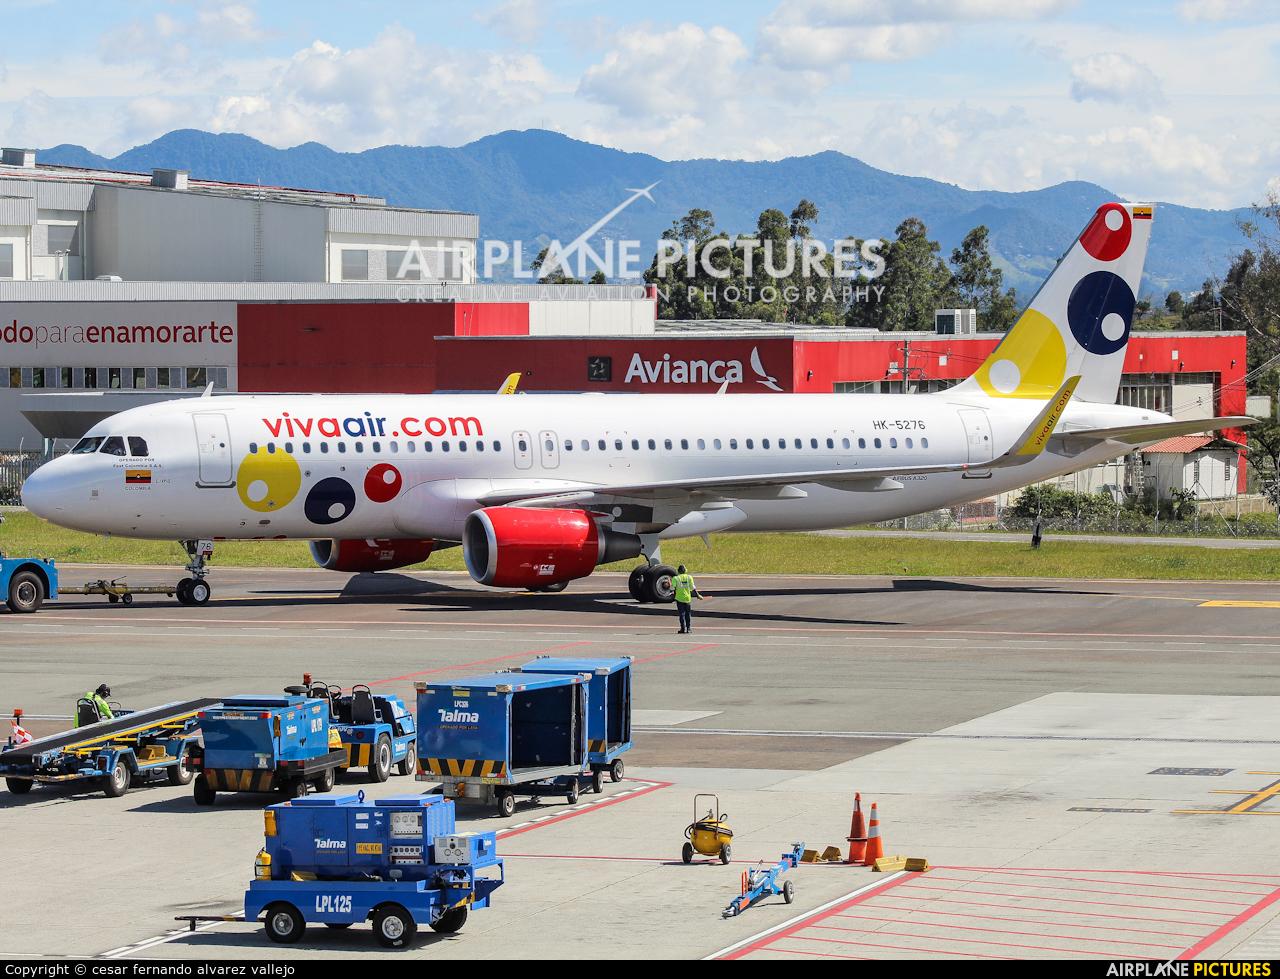 Viva Air HK-5276 aircraft at Medellin - Jose Maria Cordova Intl